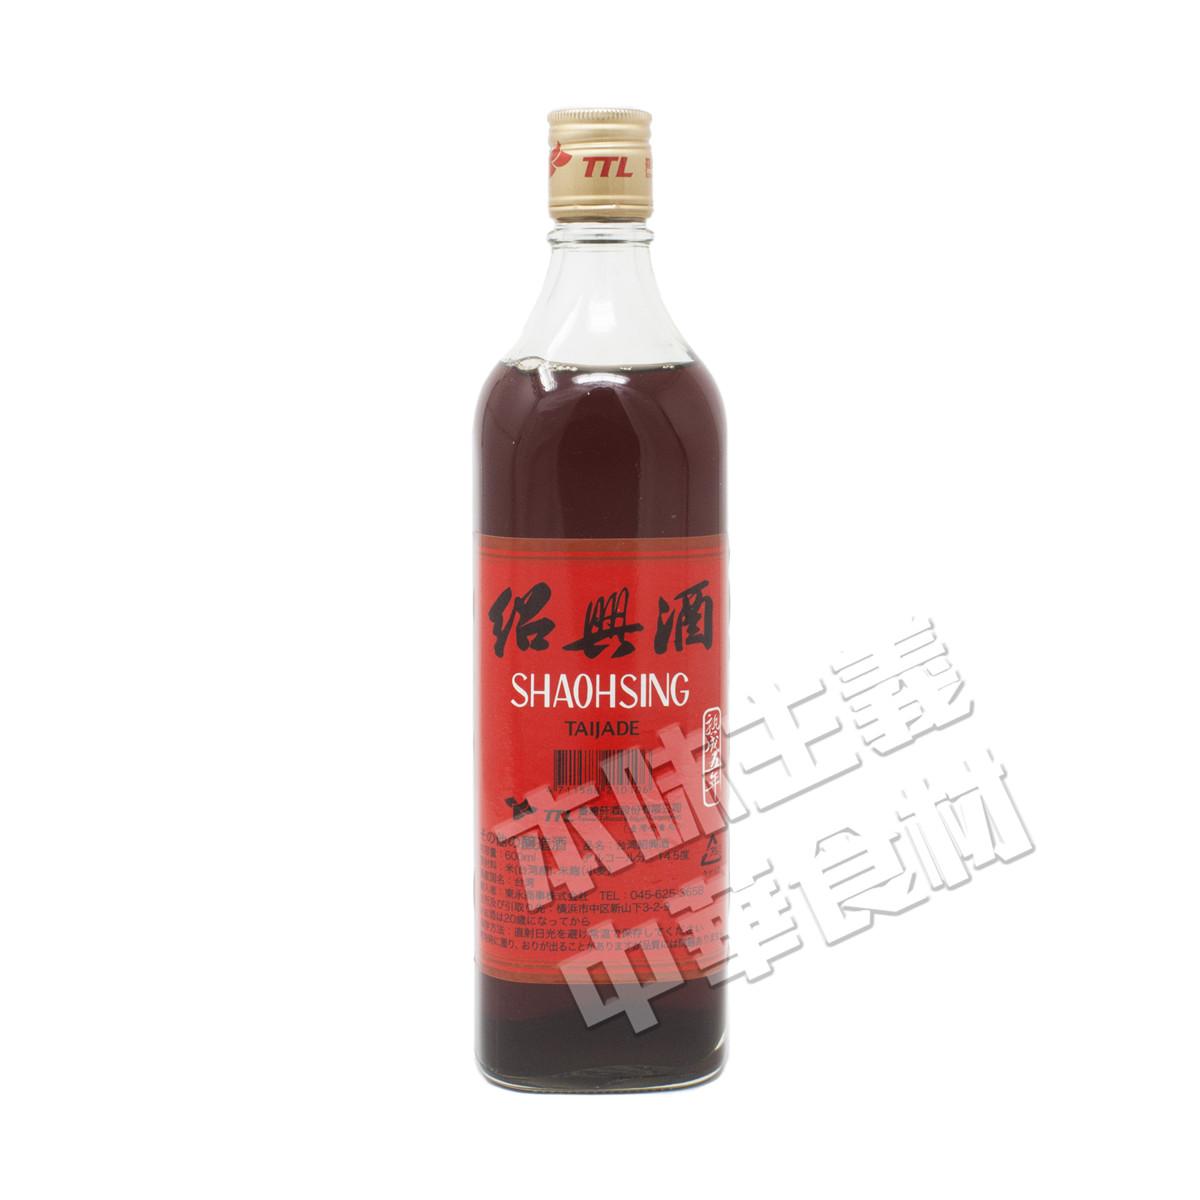 TTL台湾紹興酒5年600ml アルコール14.5 台酒 台湾酒 紹興酒 台湾産 黄酒 中華名物 大人気! 米 値下げ